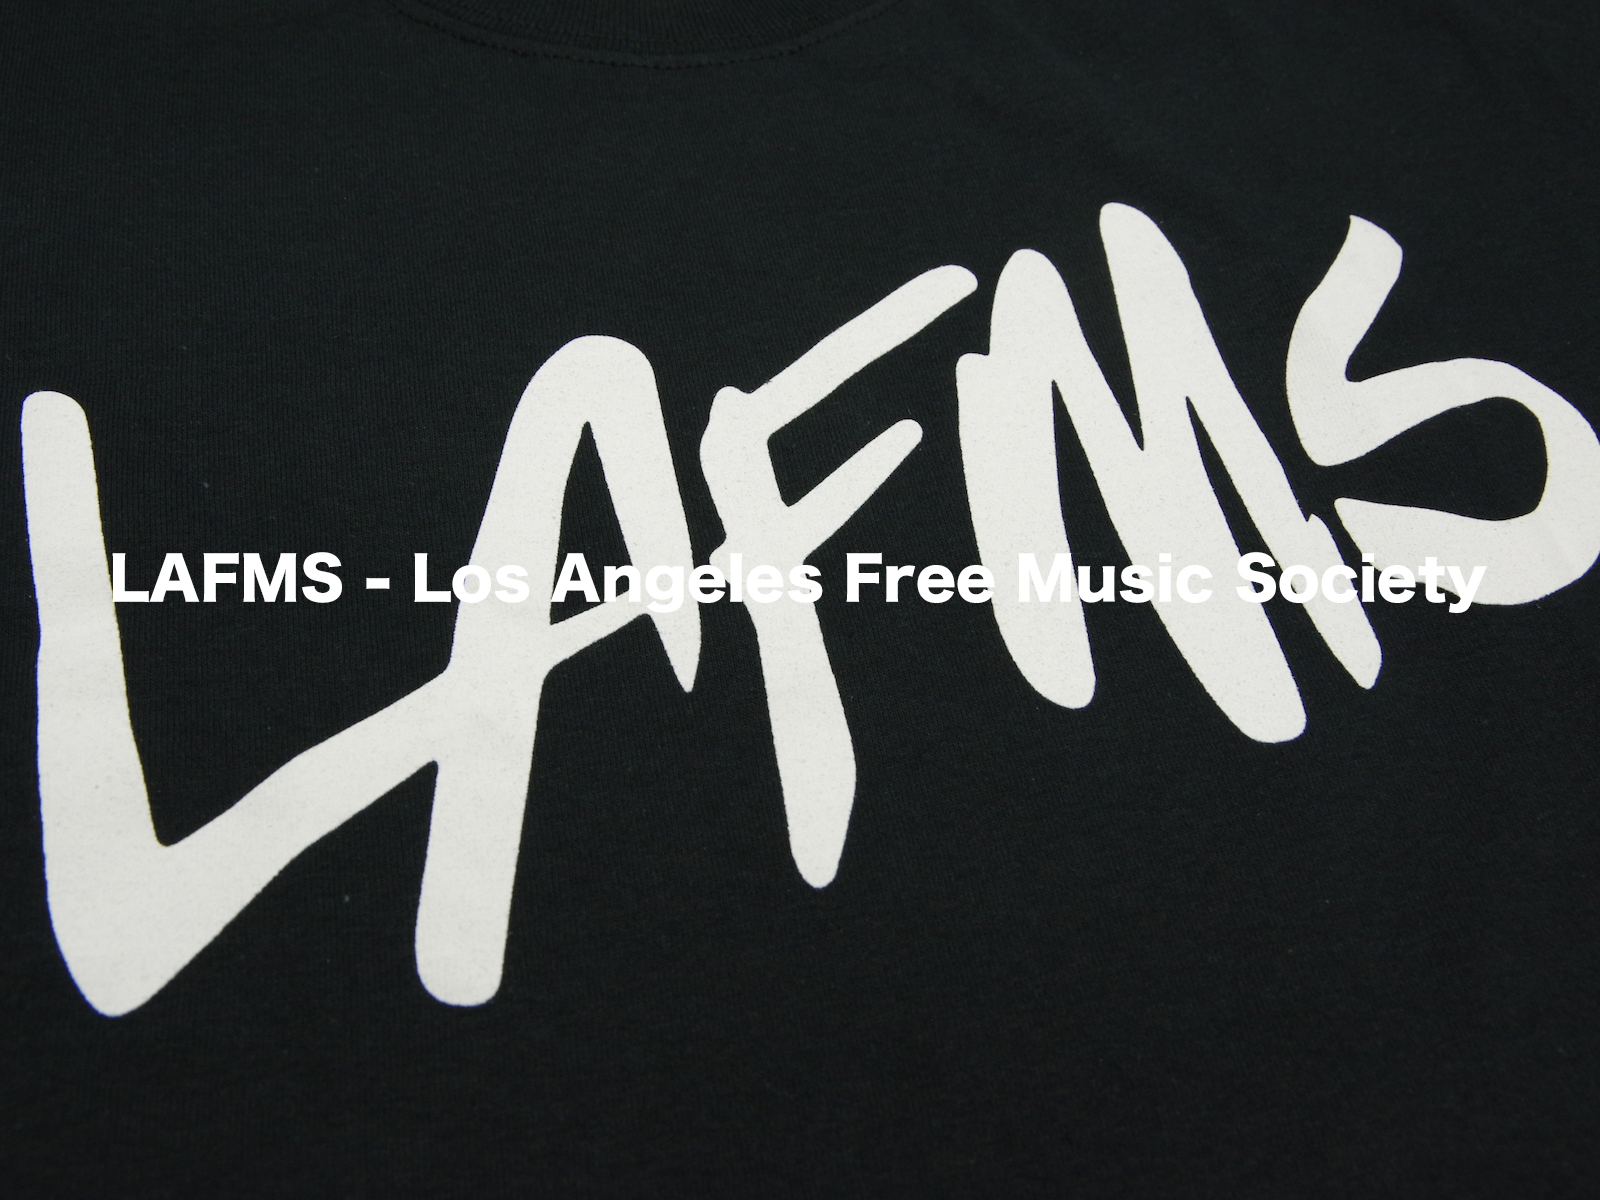 LAFMS – Los Angeles Free Music Society